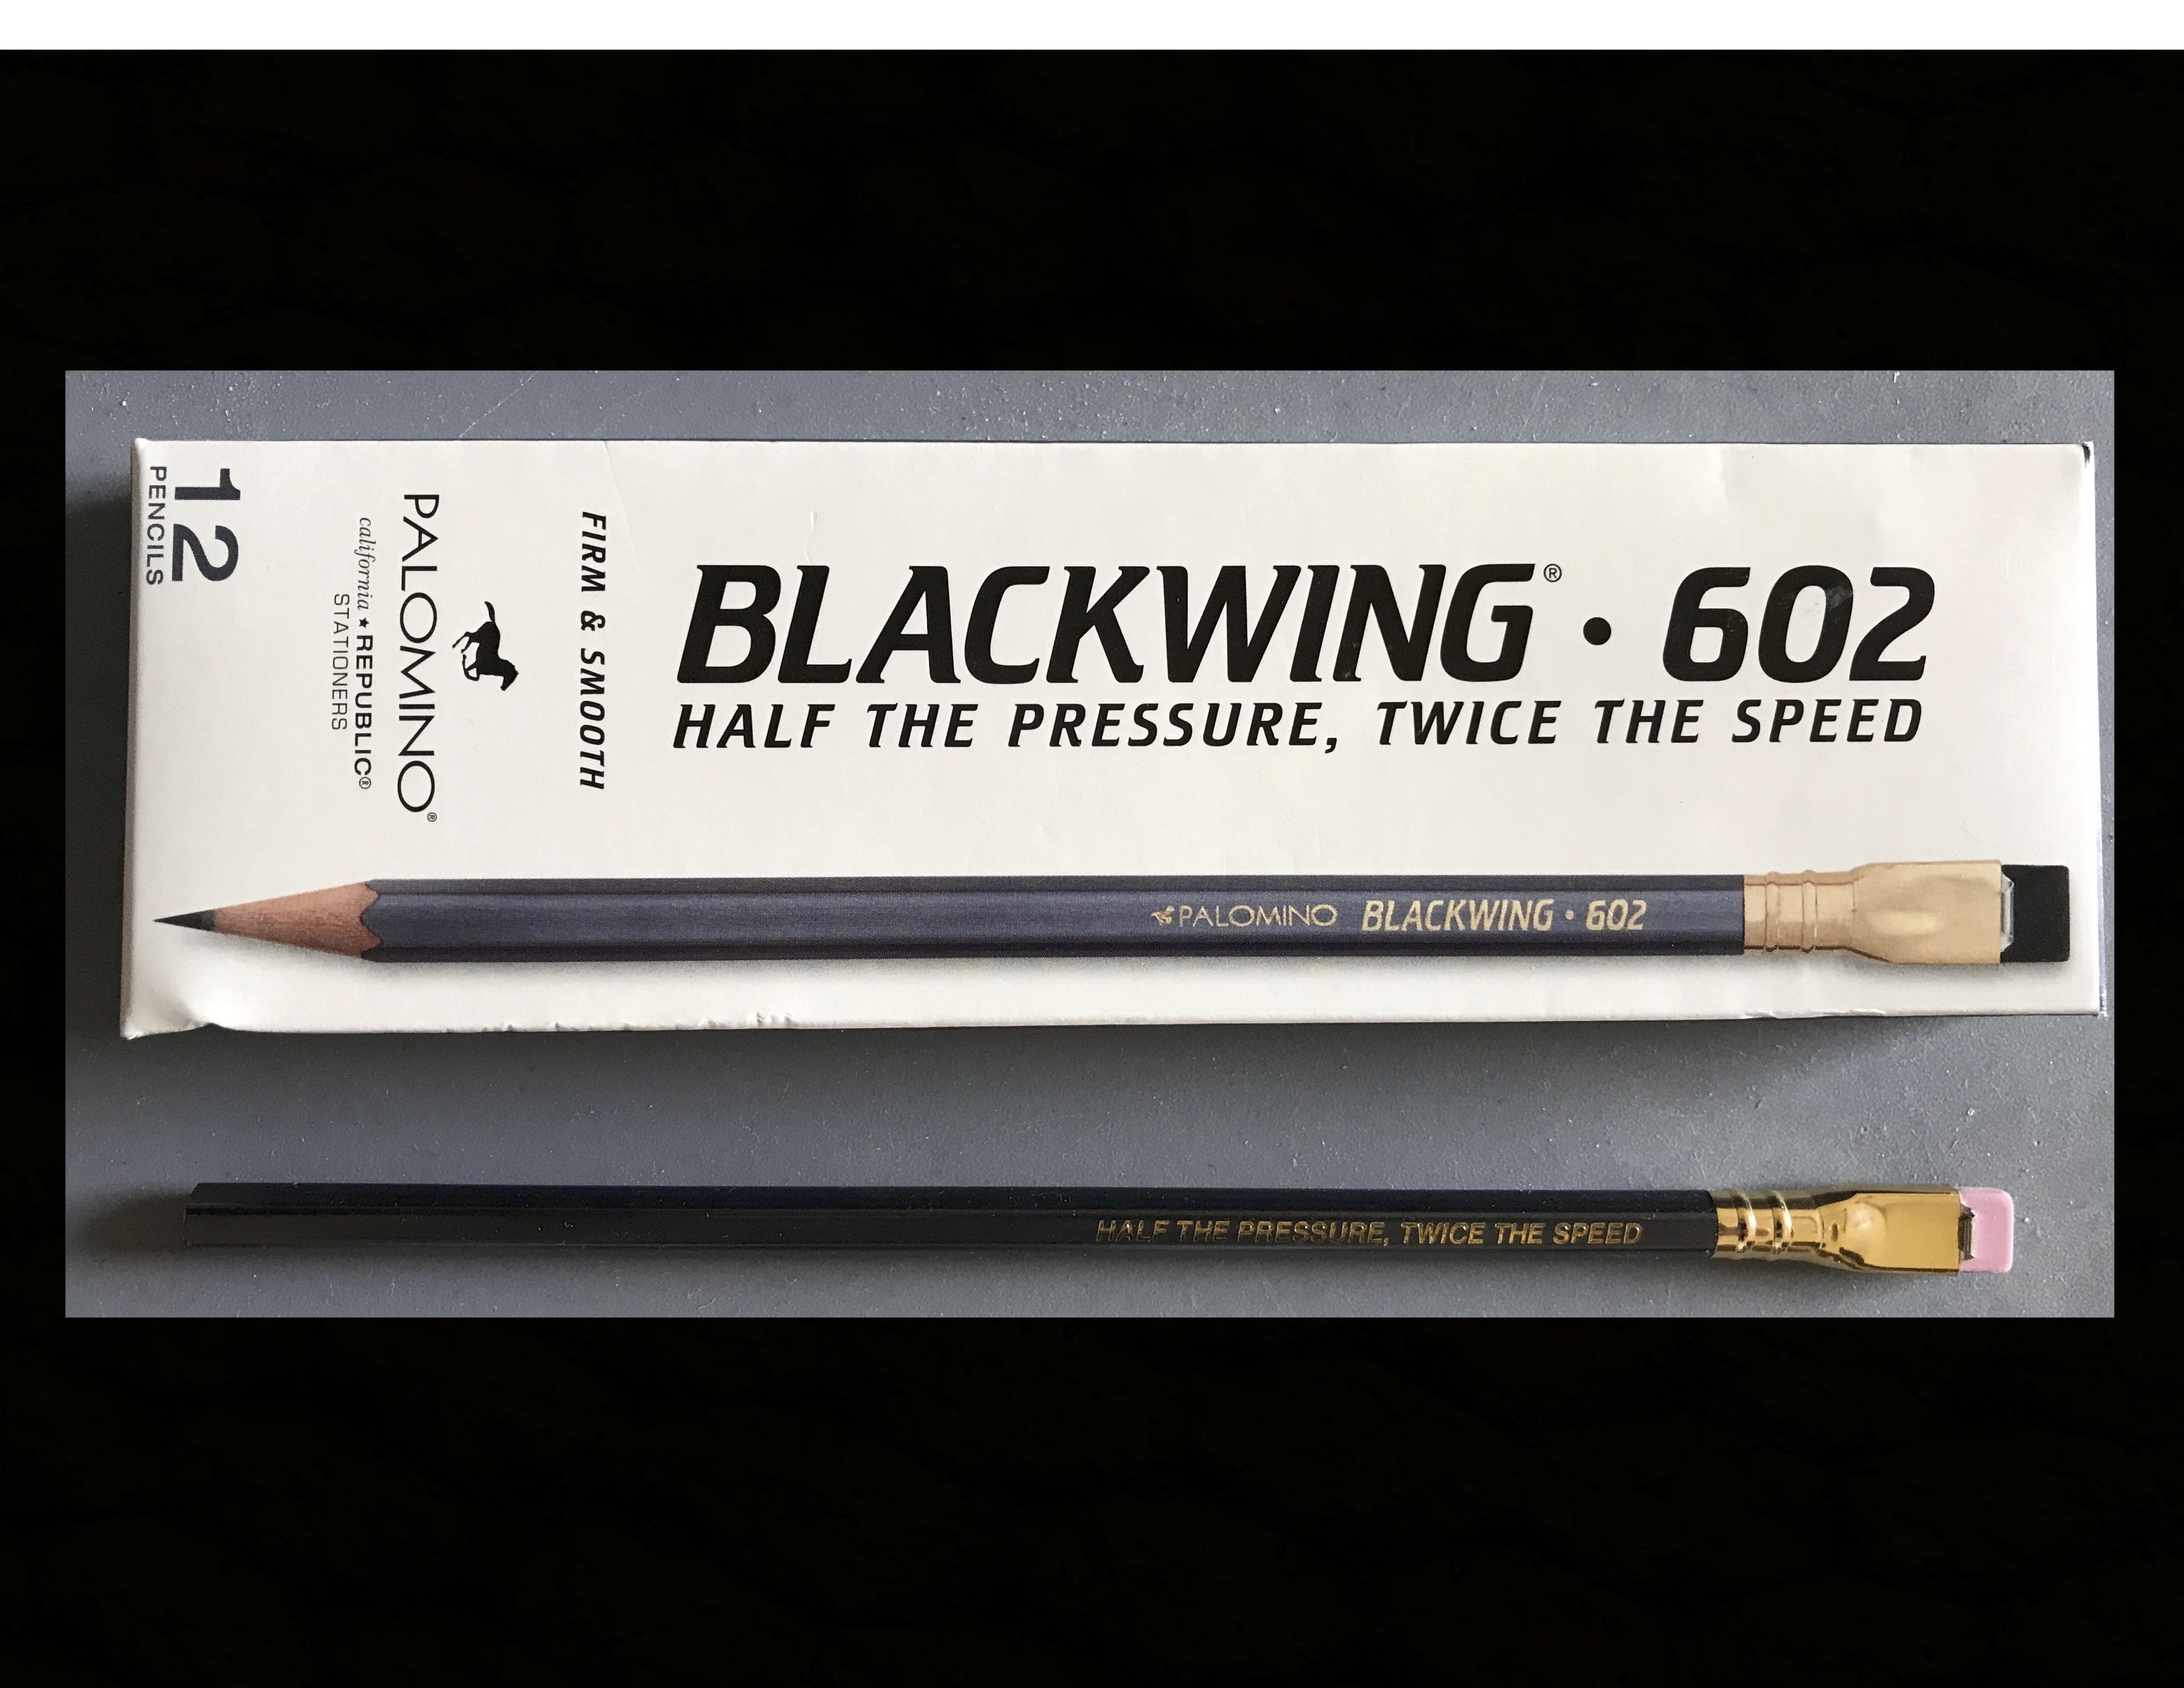 Blackwing 602 - Wikipedia